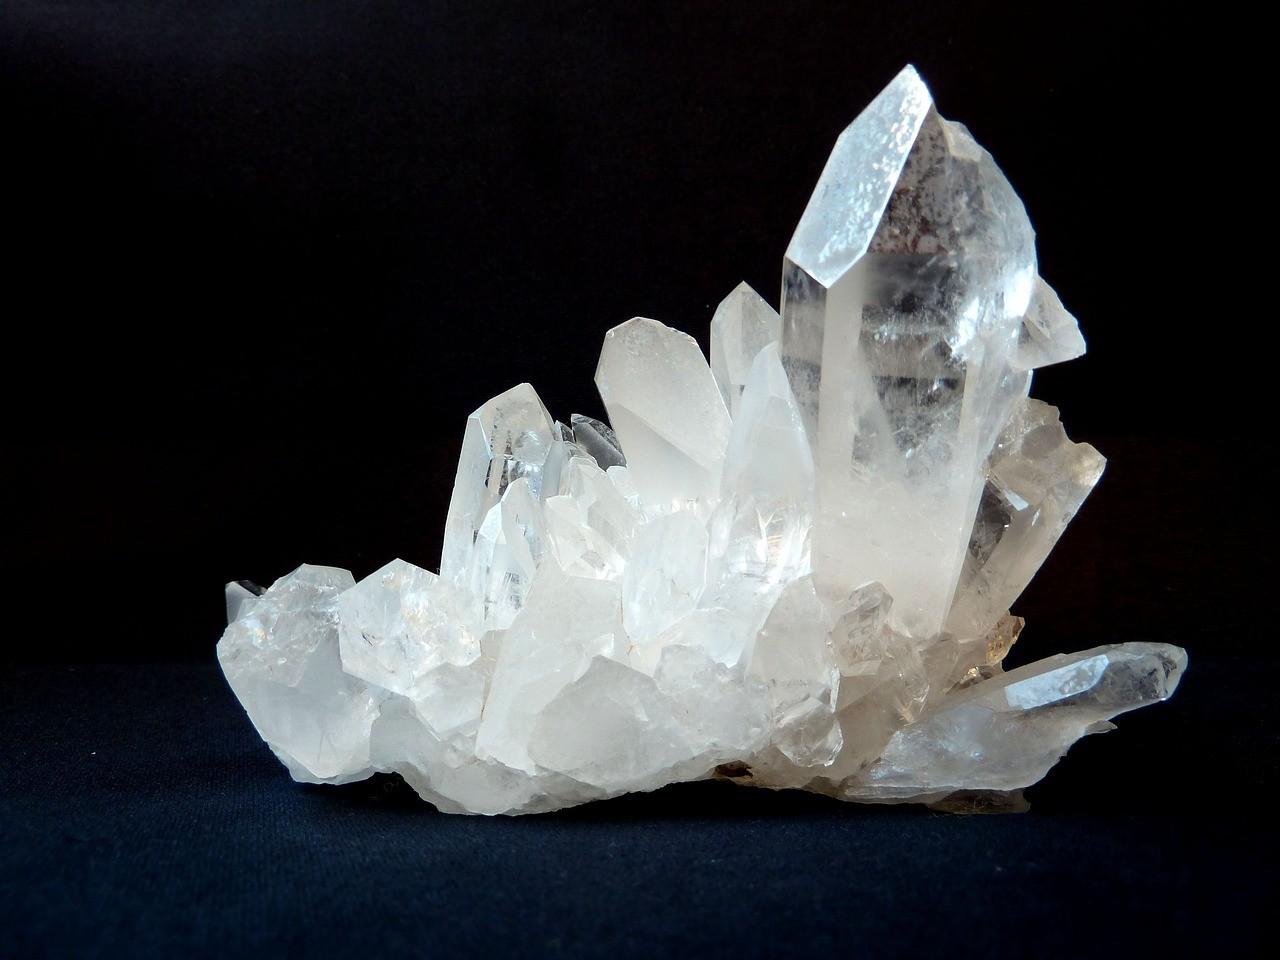 Rock crystal 1603480 1280